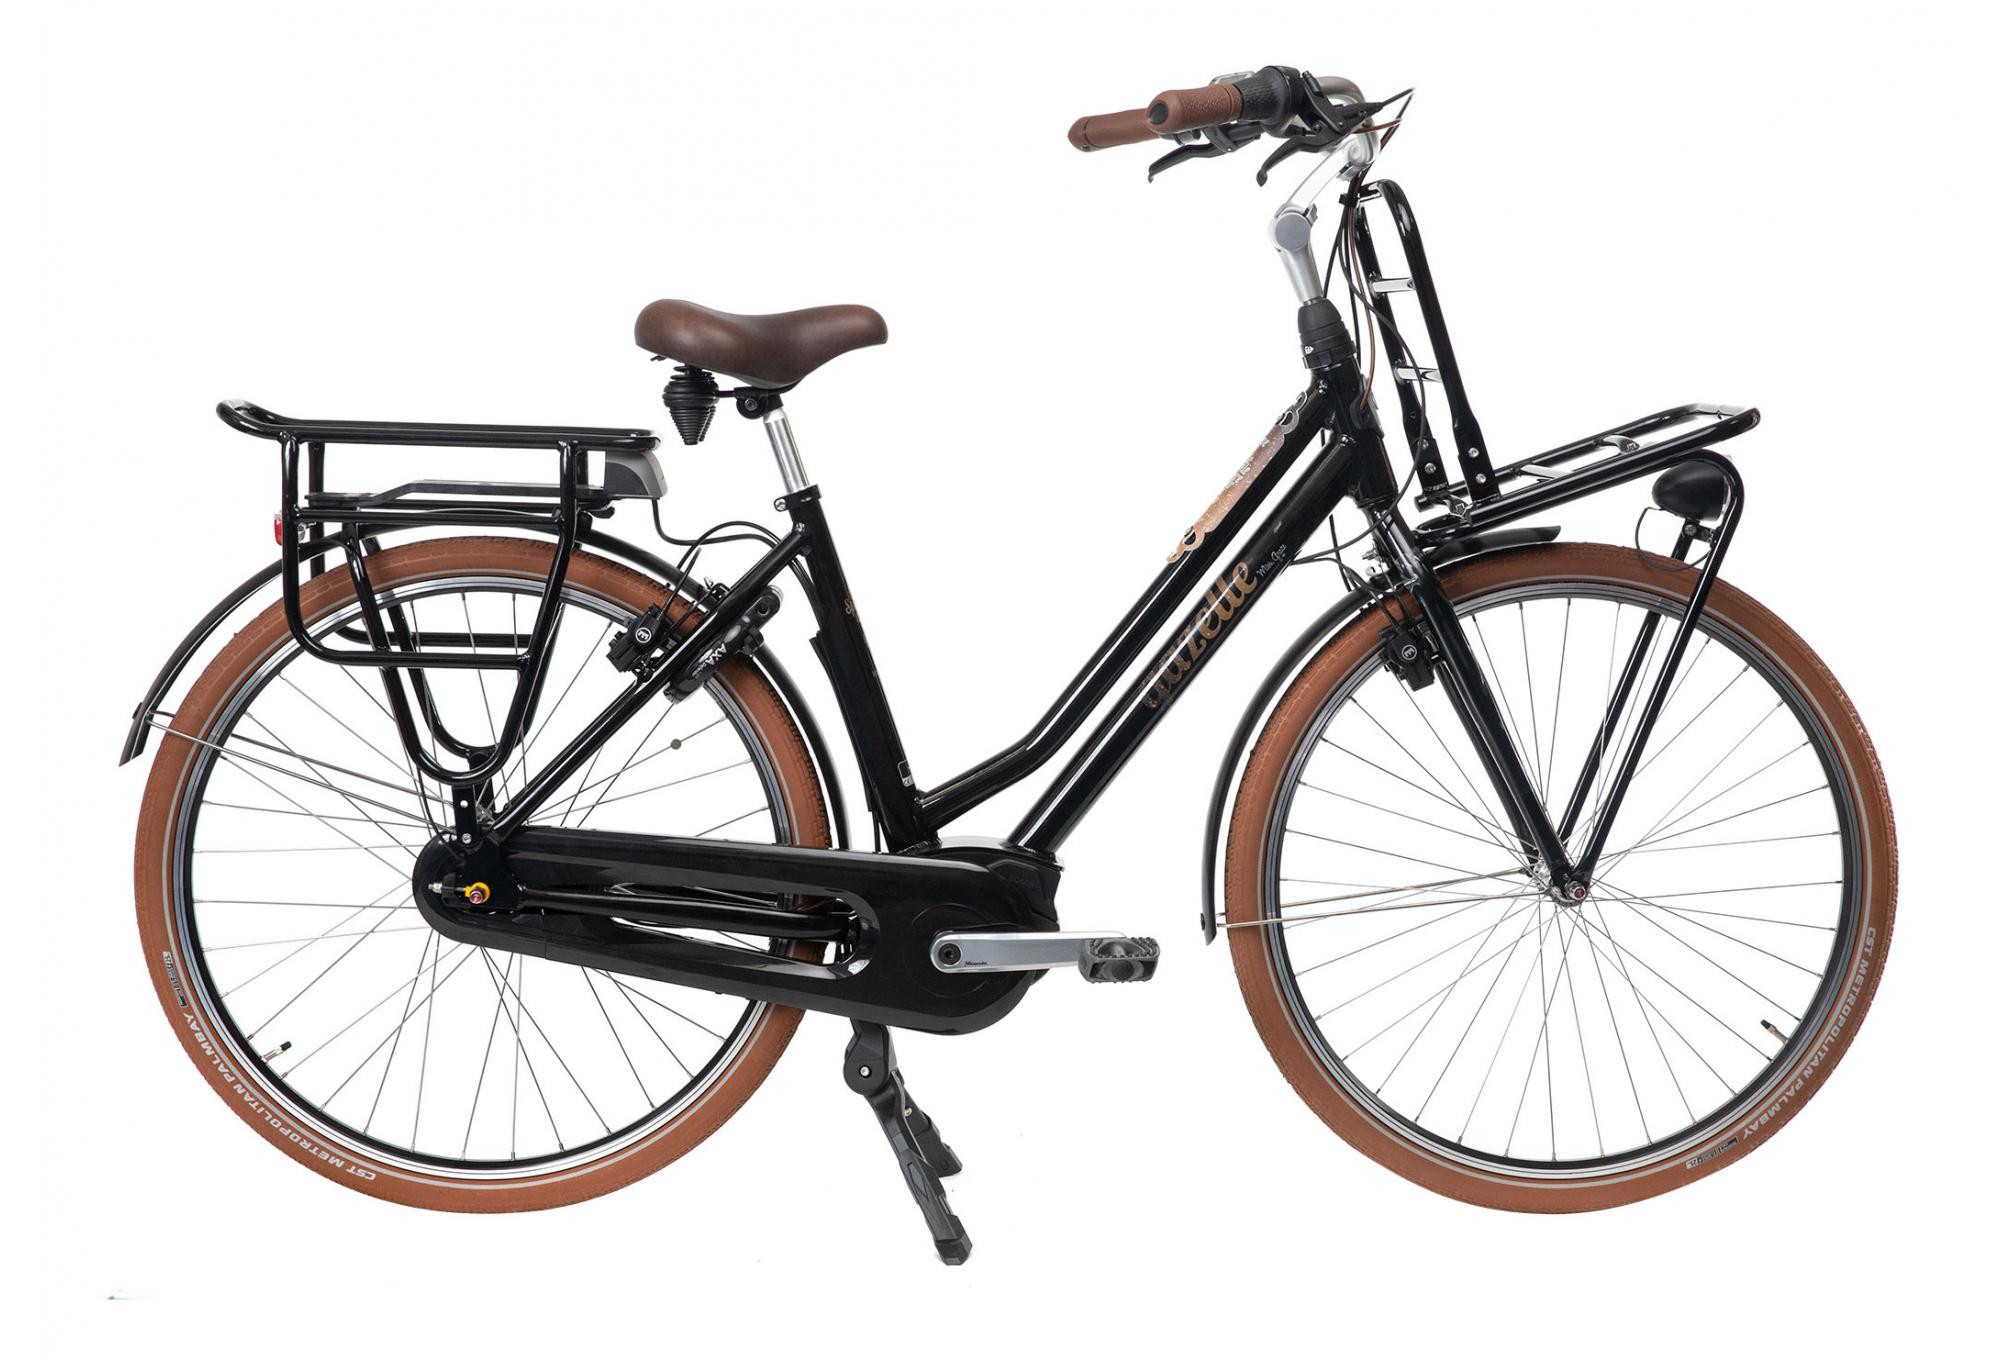 Gazelle-Luggage Carrier Innergy E-Bike Heavy Duty Miss Grace White